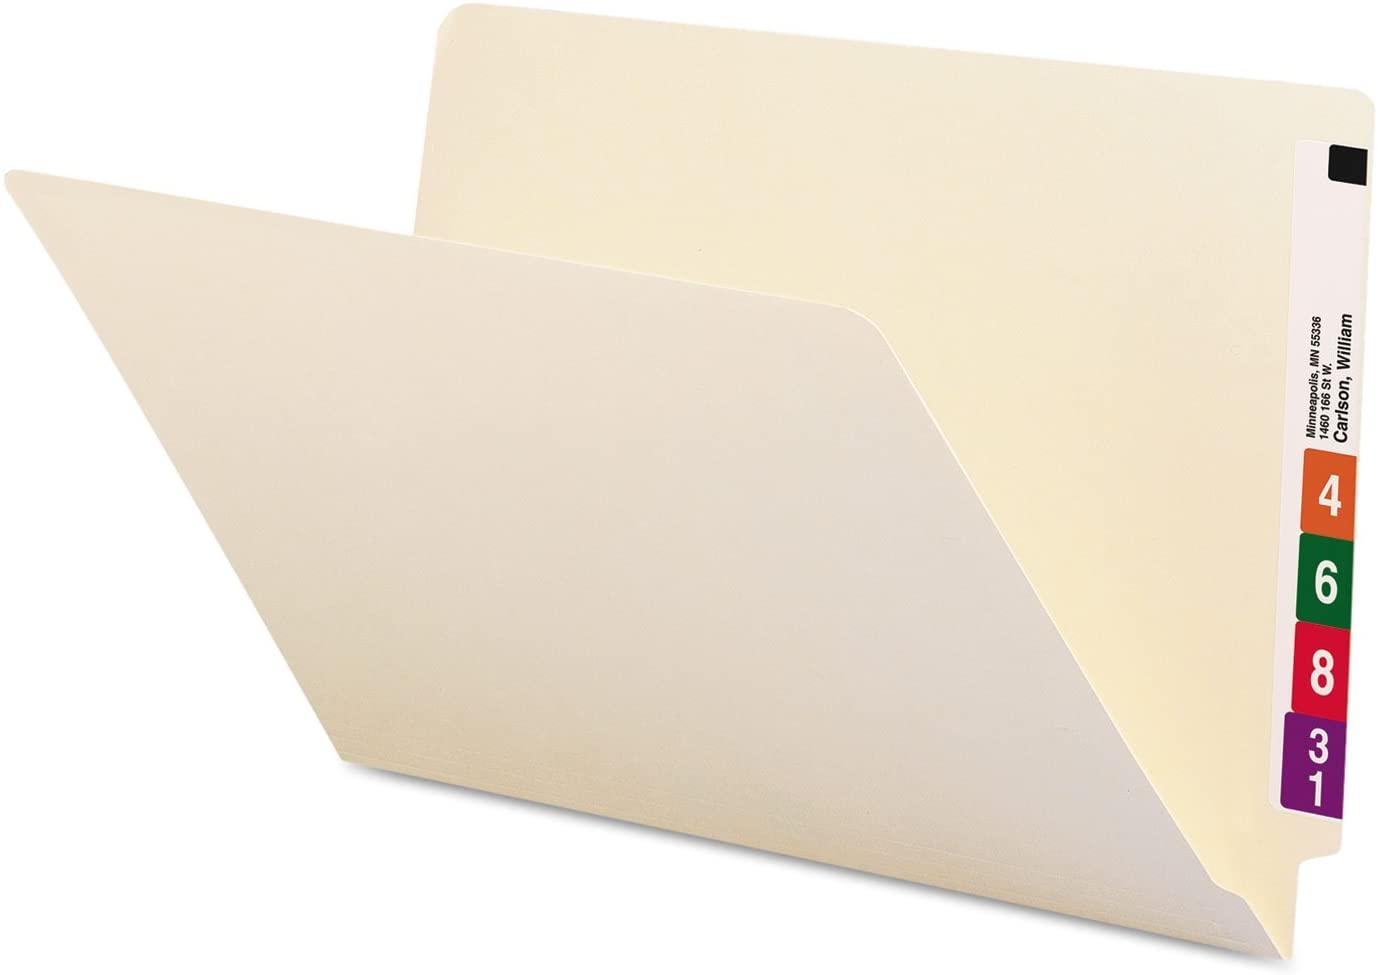 Smead Shelf-Master End-Tab Folders, 9 1/2